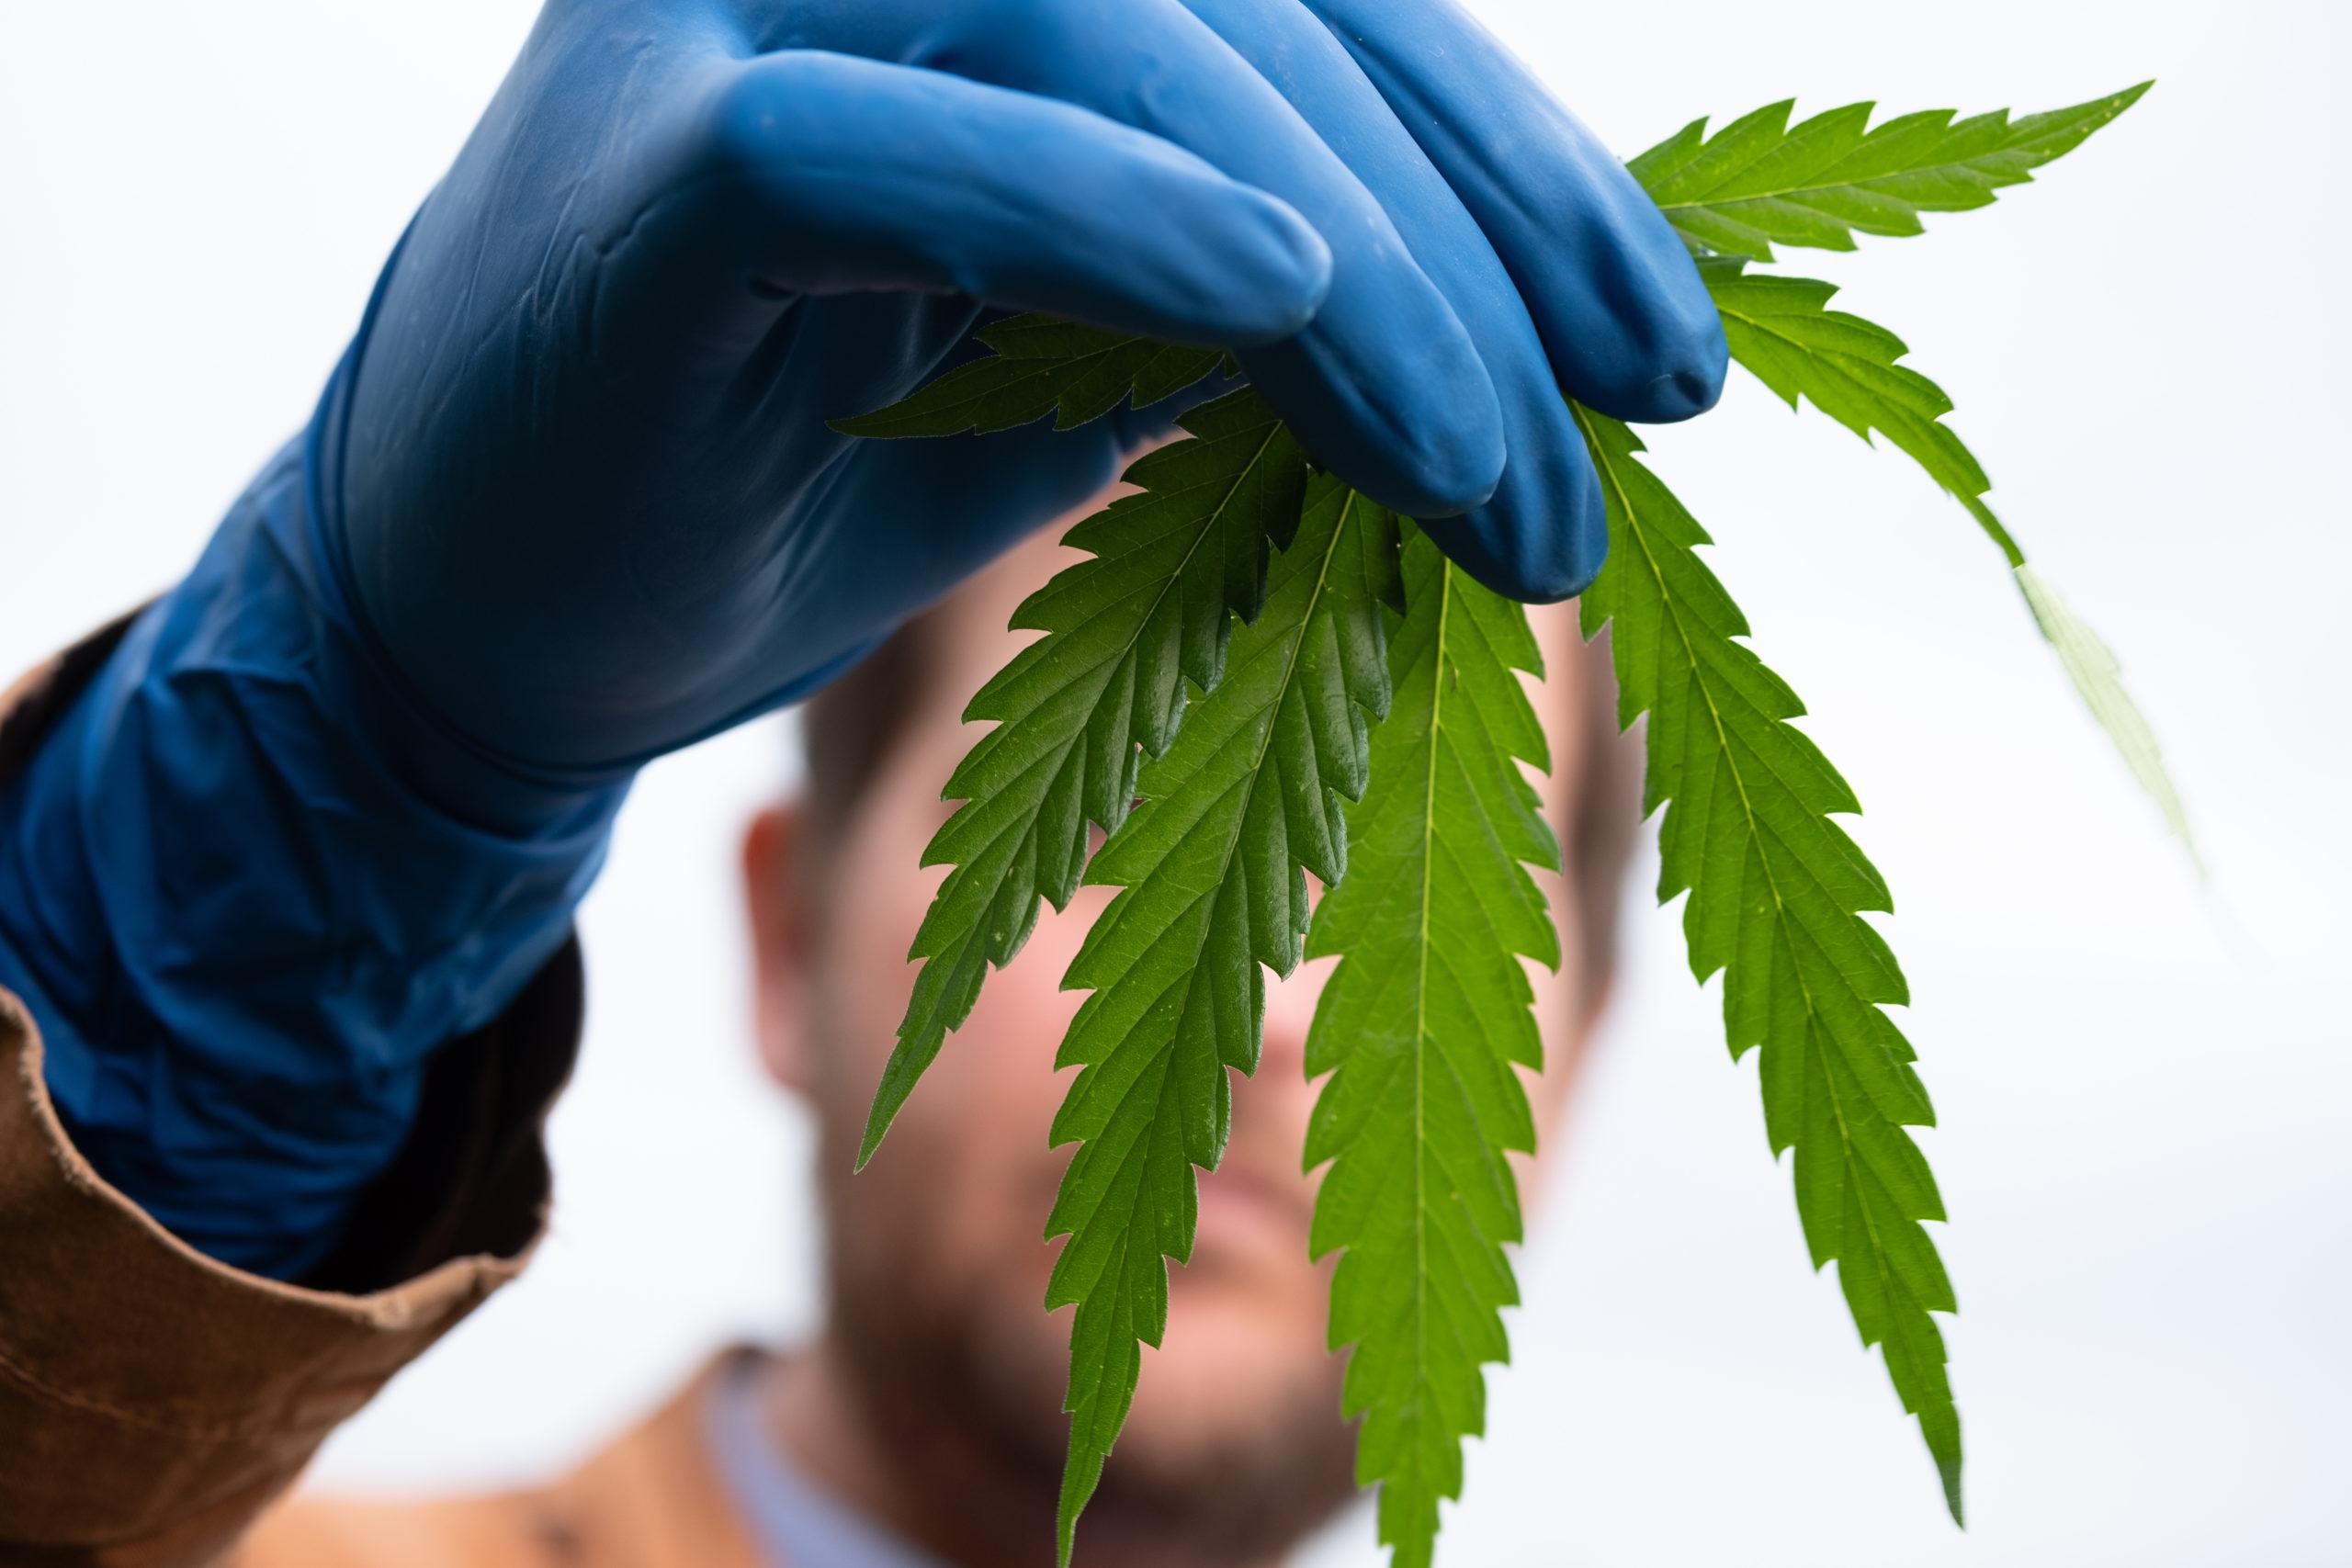 Who will be last? Wyoming, Idaho, Kansas, S.C. only states where marijuana is fully criminalized